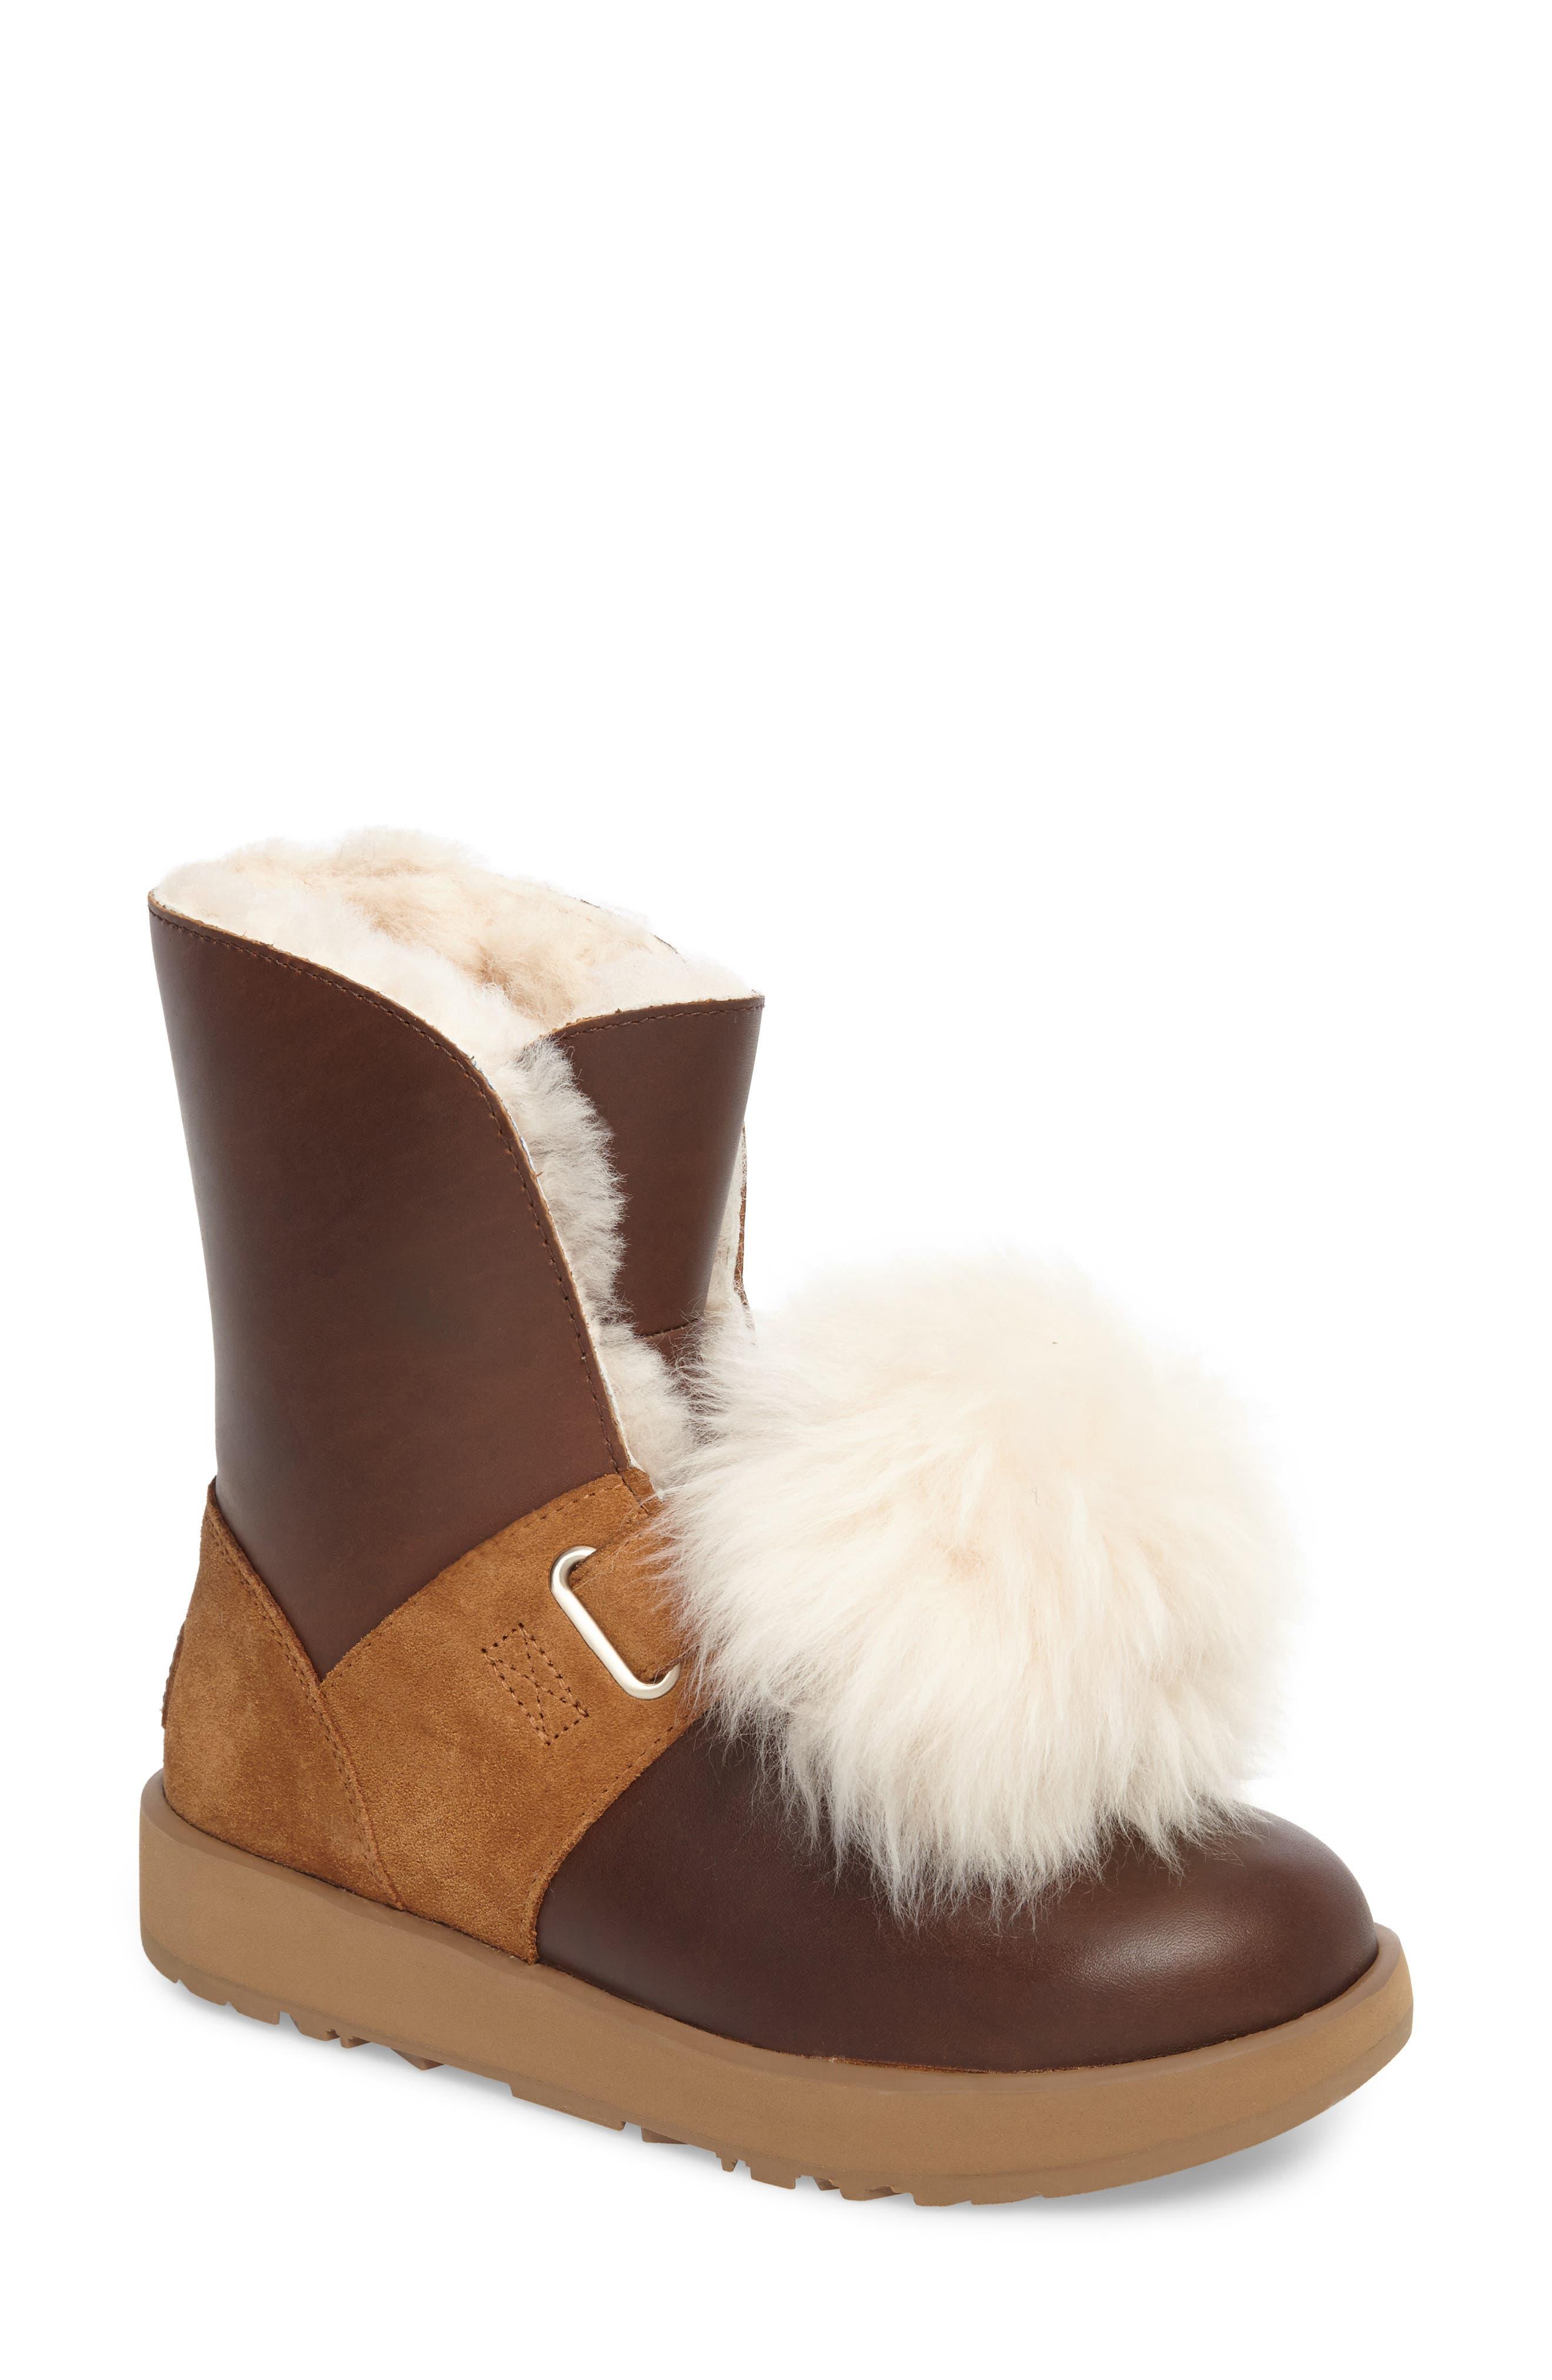 Main Image - UGG® Isley Genuine Shearling Pompom Waterproof Boot (Women)